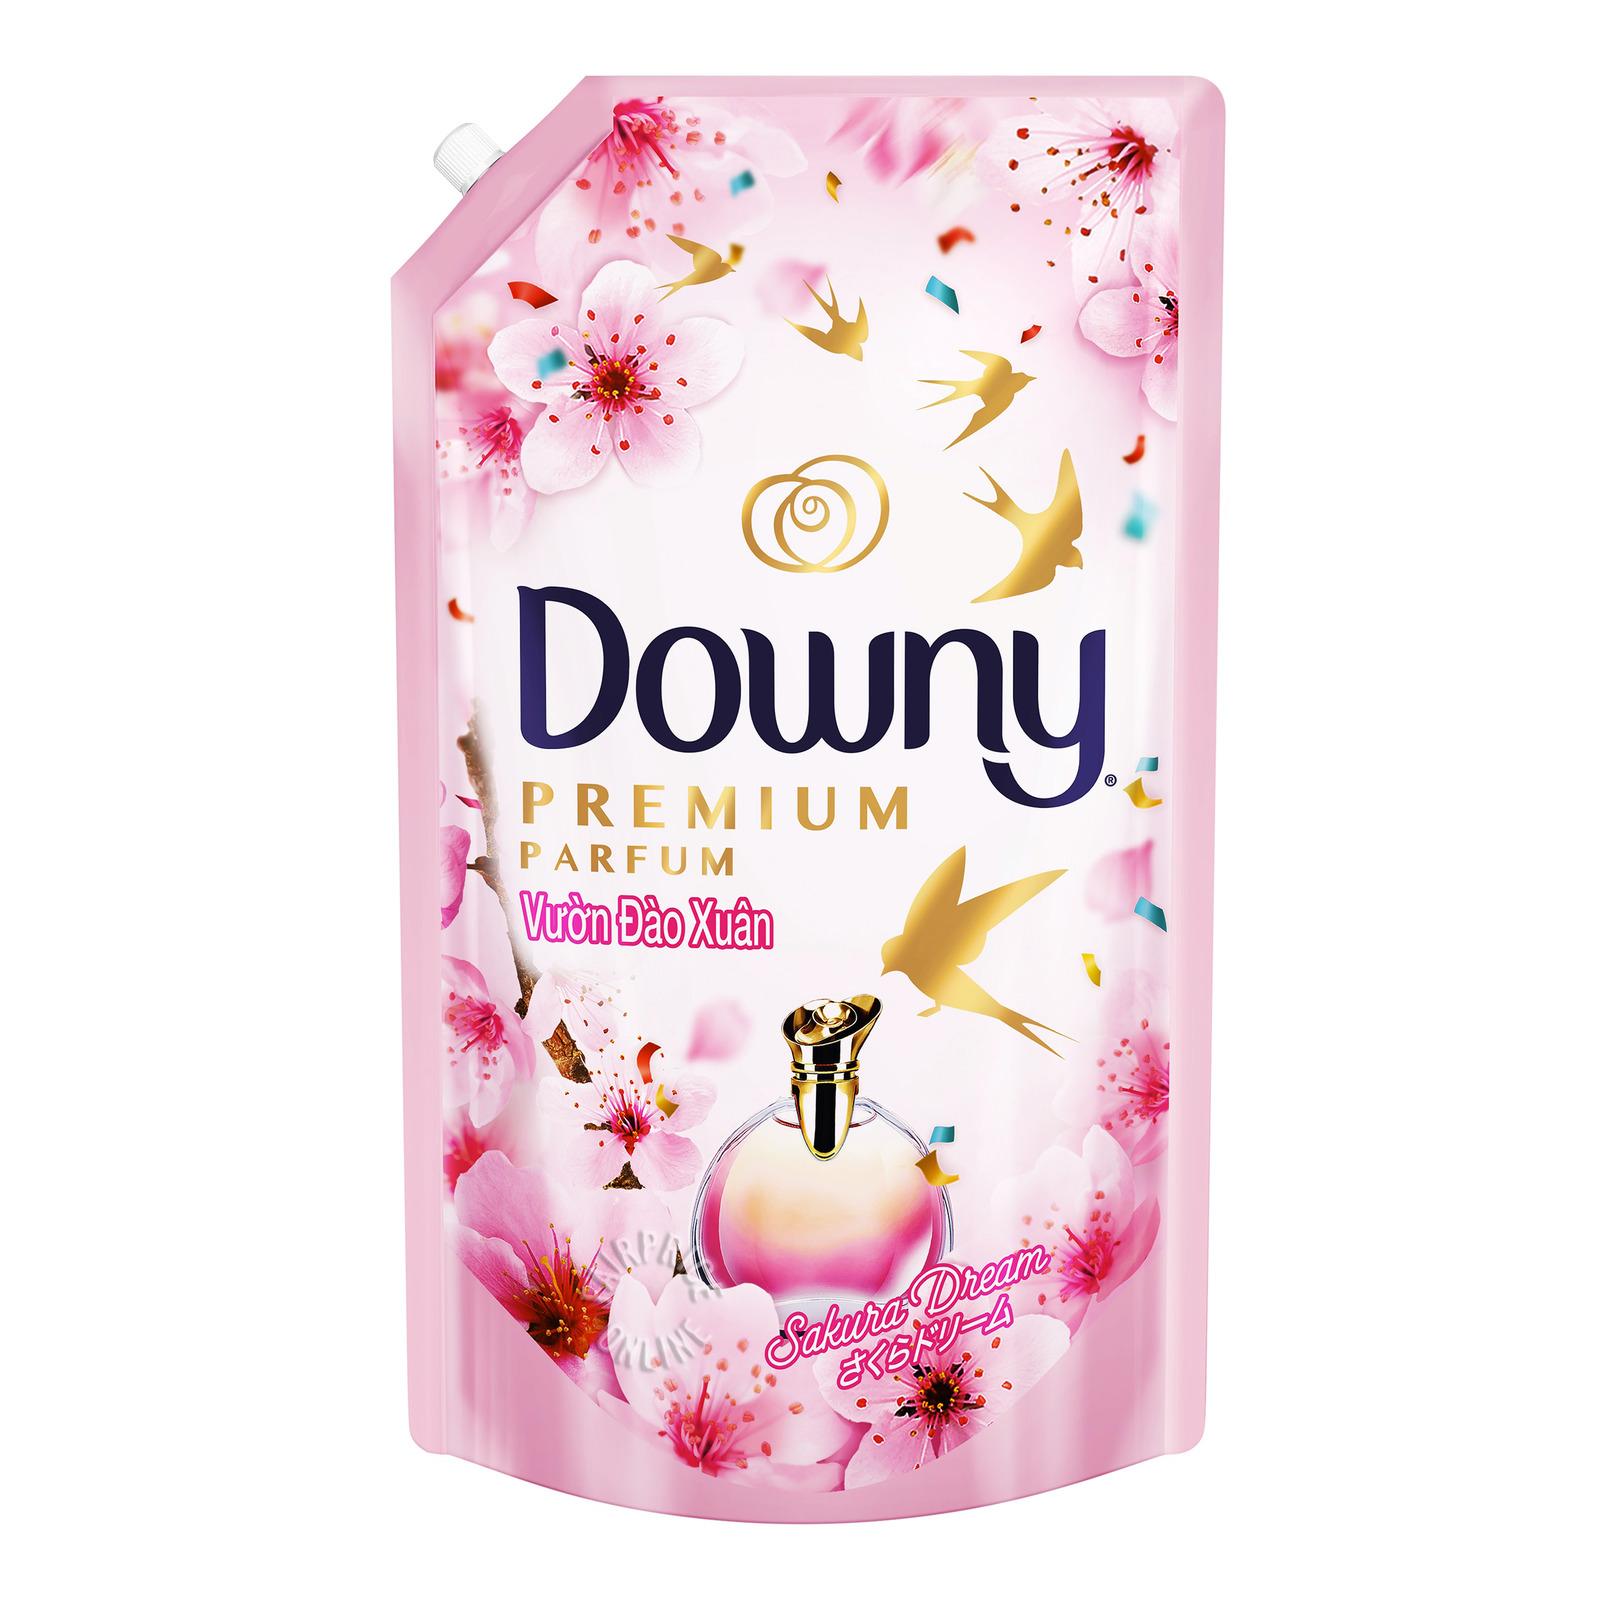 Downy Premium Parfum - Sakura Dream